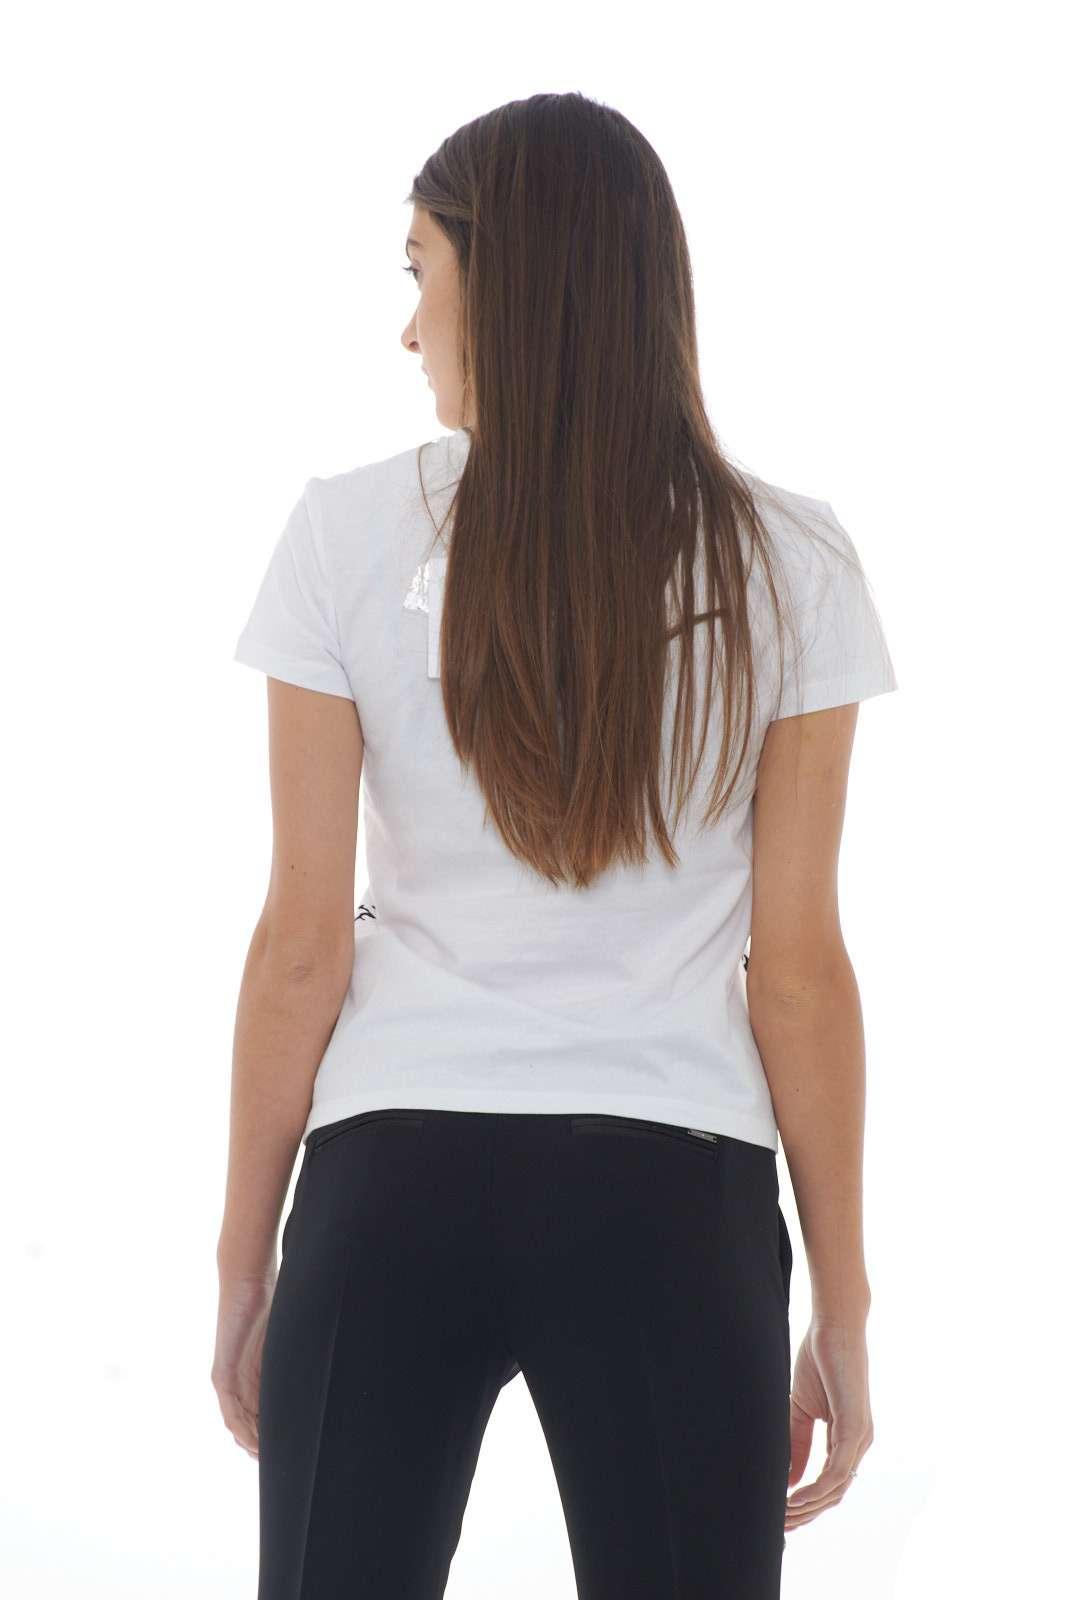 https://www.parmax.com/media/catalog/product/a/i/AI-outlet_parmax-t-shirt-donna-Patrizia-Pepe-2M3819-C.jpg